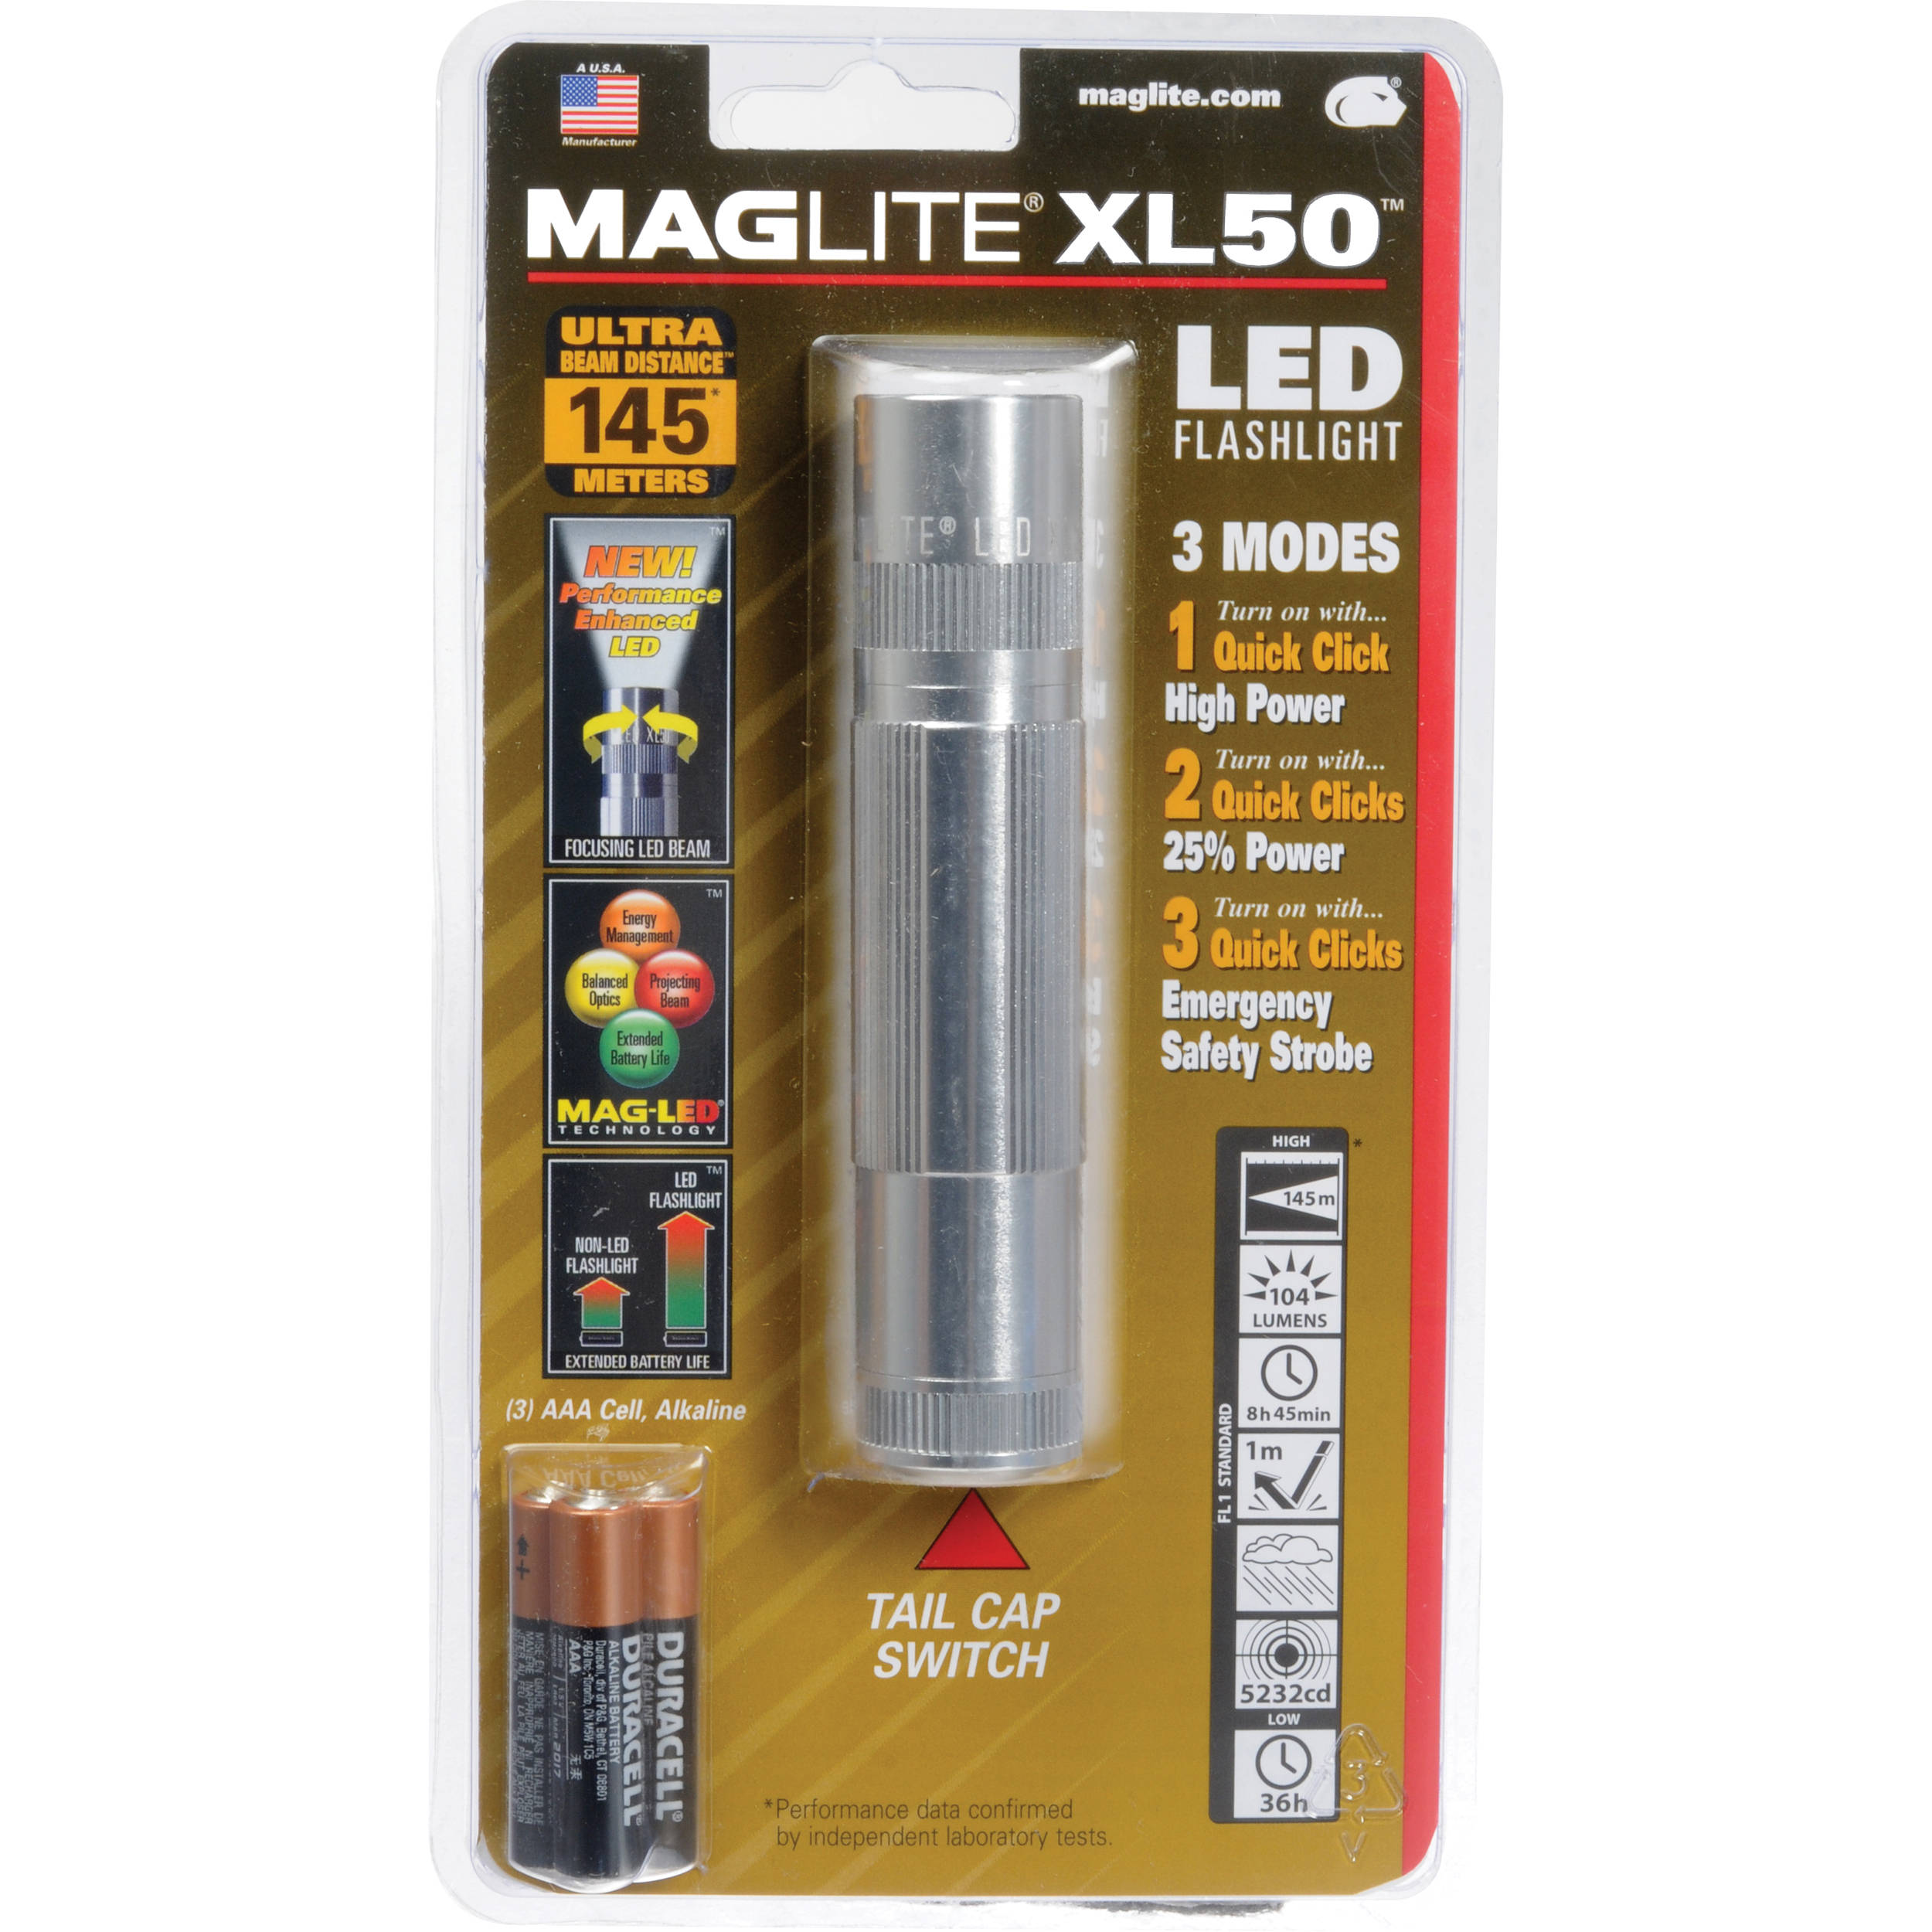 Maglite XL50 LED Flashlight XL50-S3106 B&H Photo Video